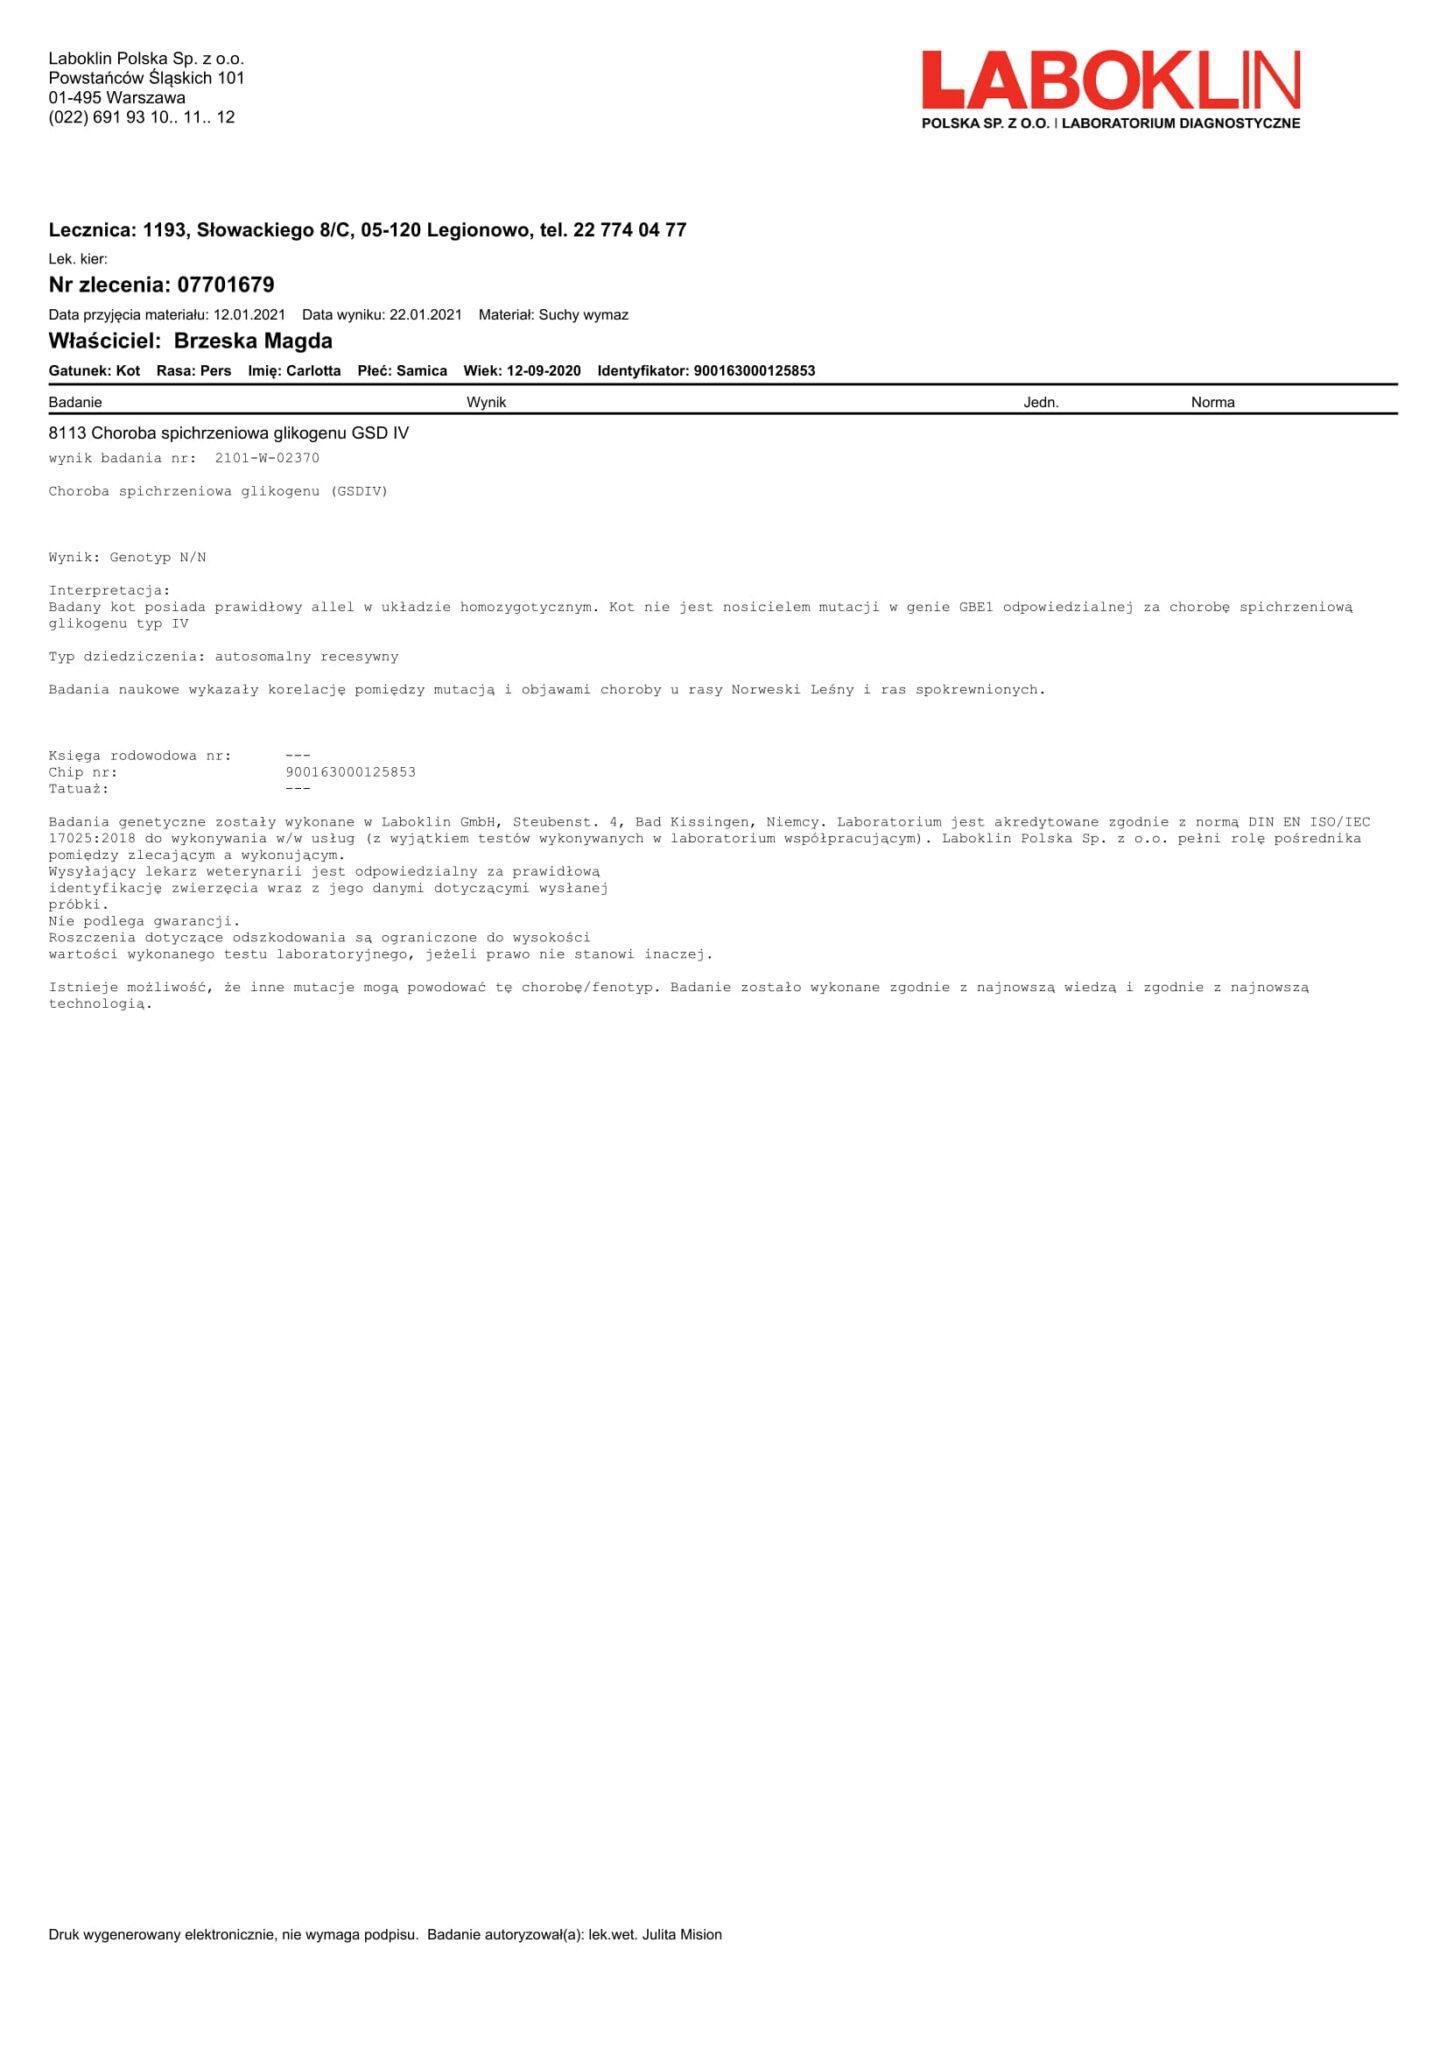 Brzeska-Magda-07701679-22.01.2021-1_3-3-1 Breeding